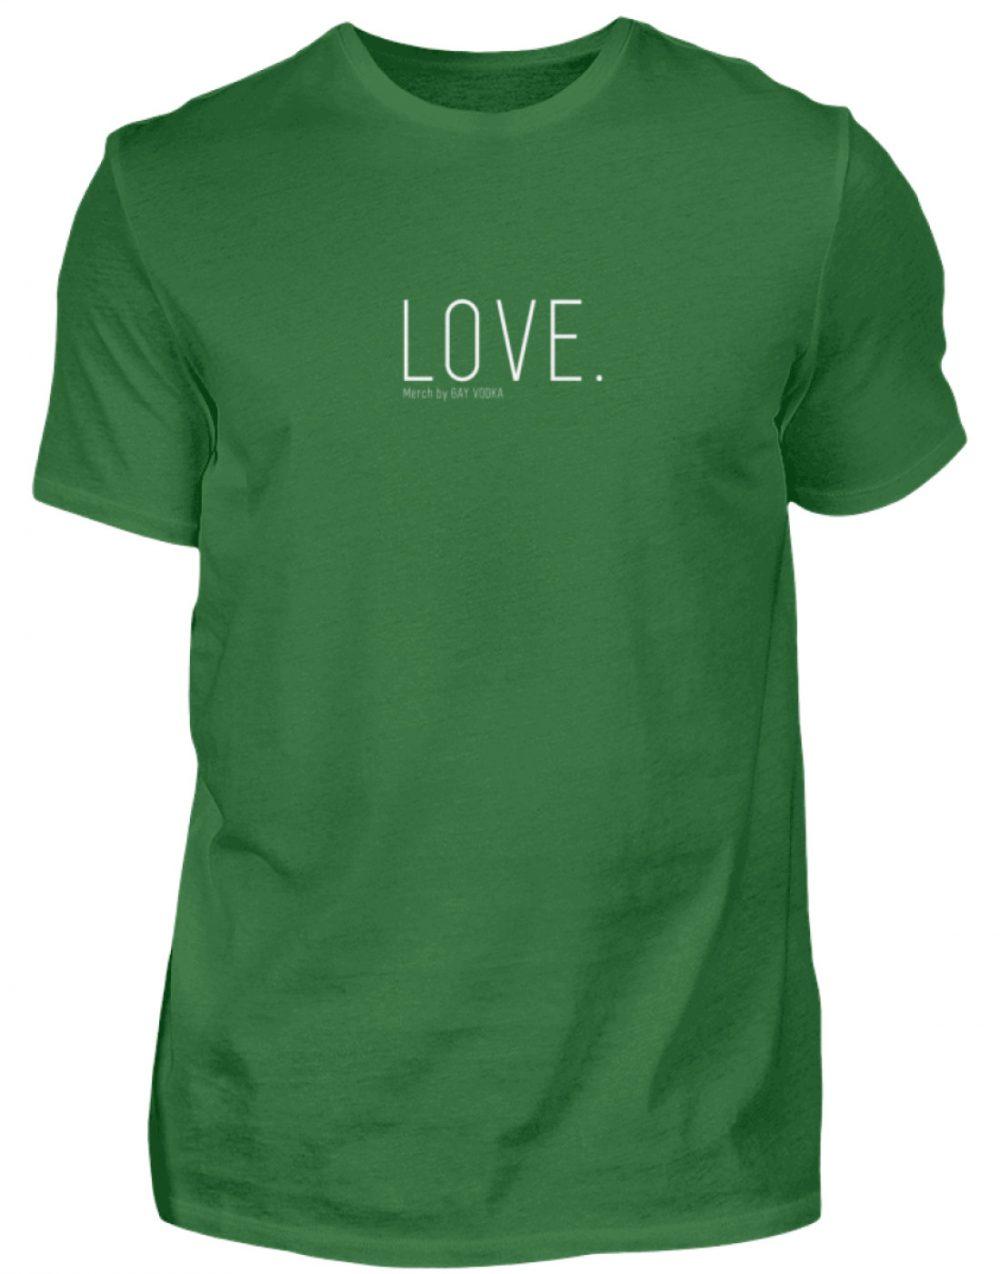 LOVE. - Herren Premiumshirt-30